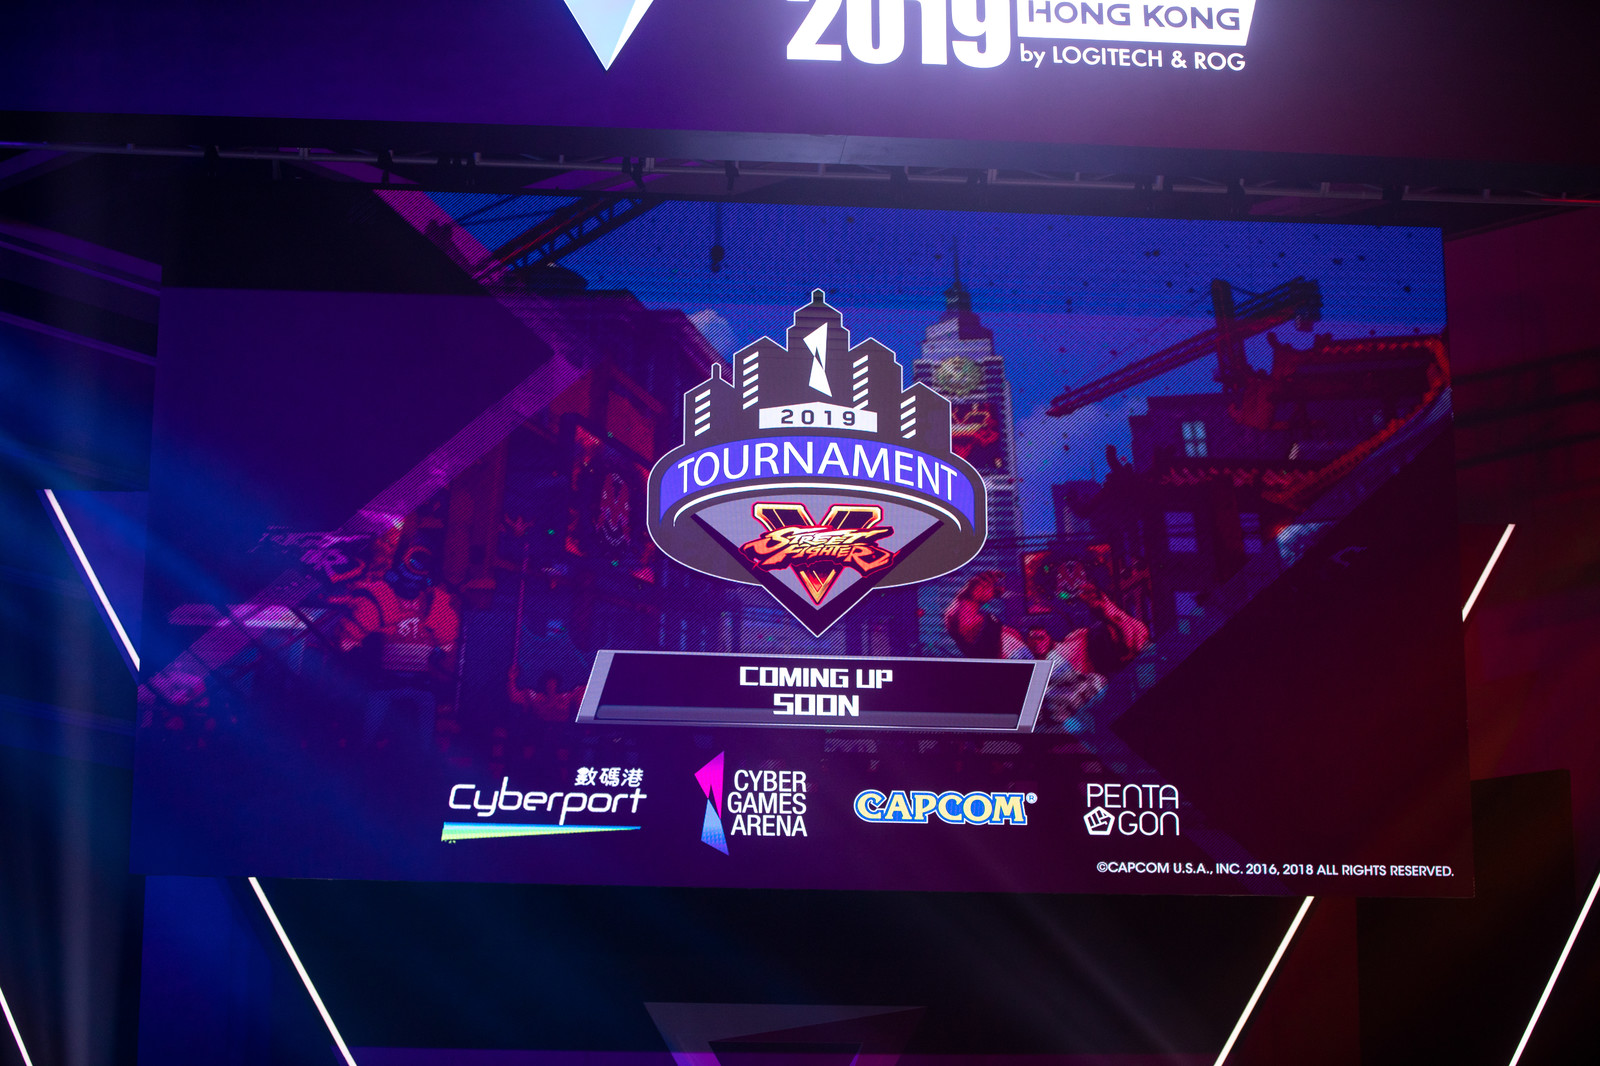 「COMING UP SOON  - E-Sports Festival Hong Kong 2019」の写真